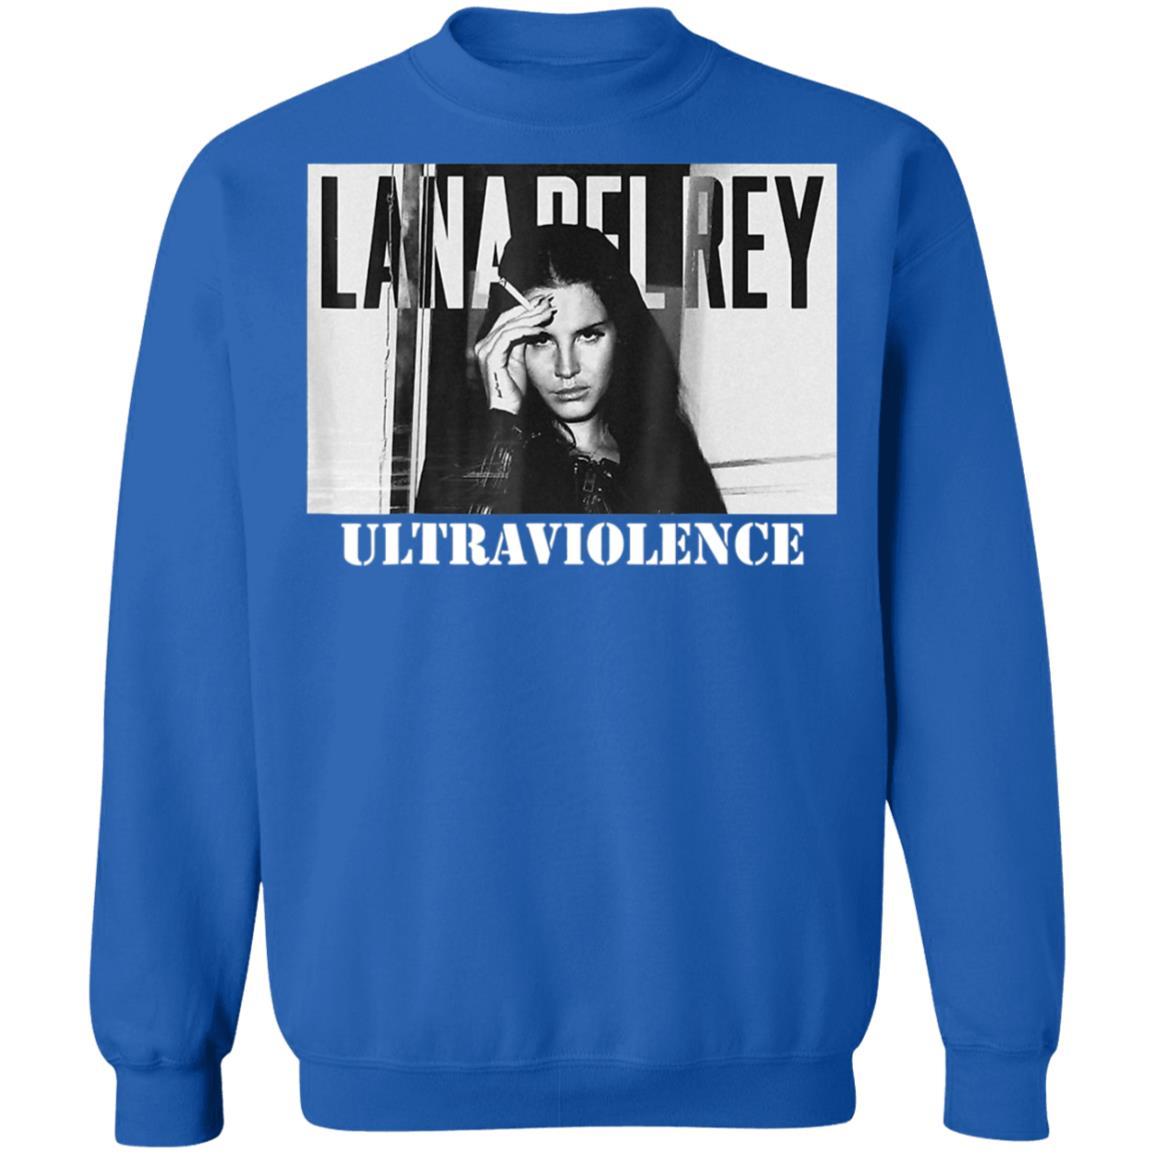 Lana Del Rey Ultraviolence Shirt Tipatee